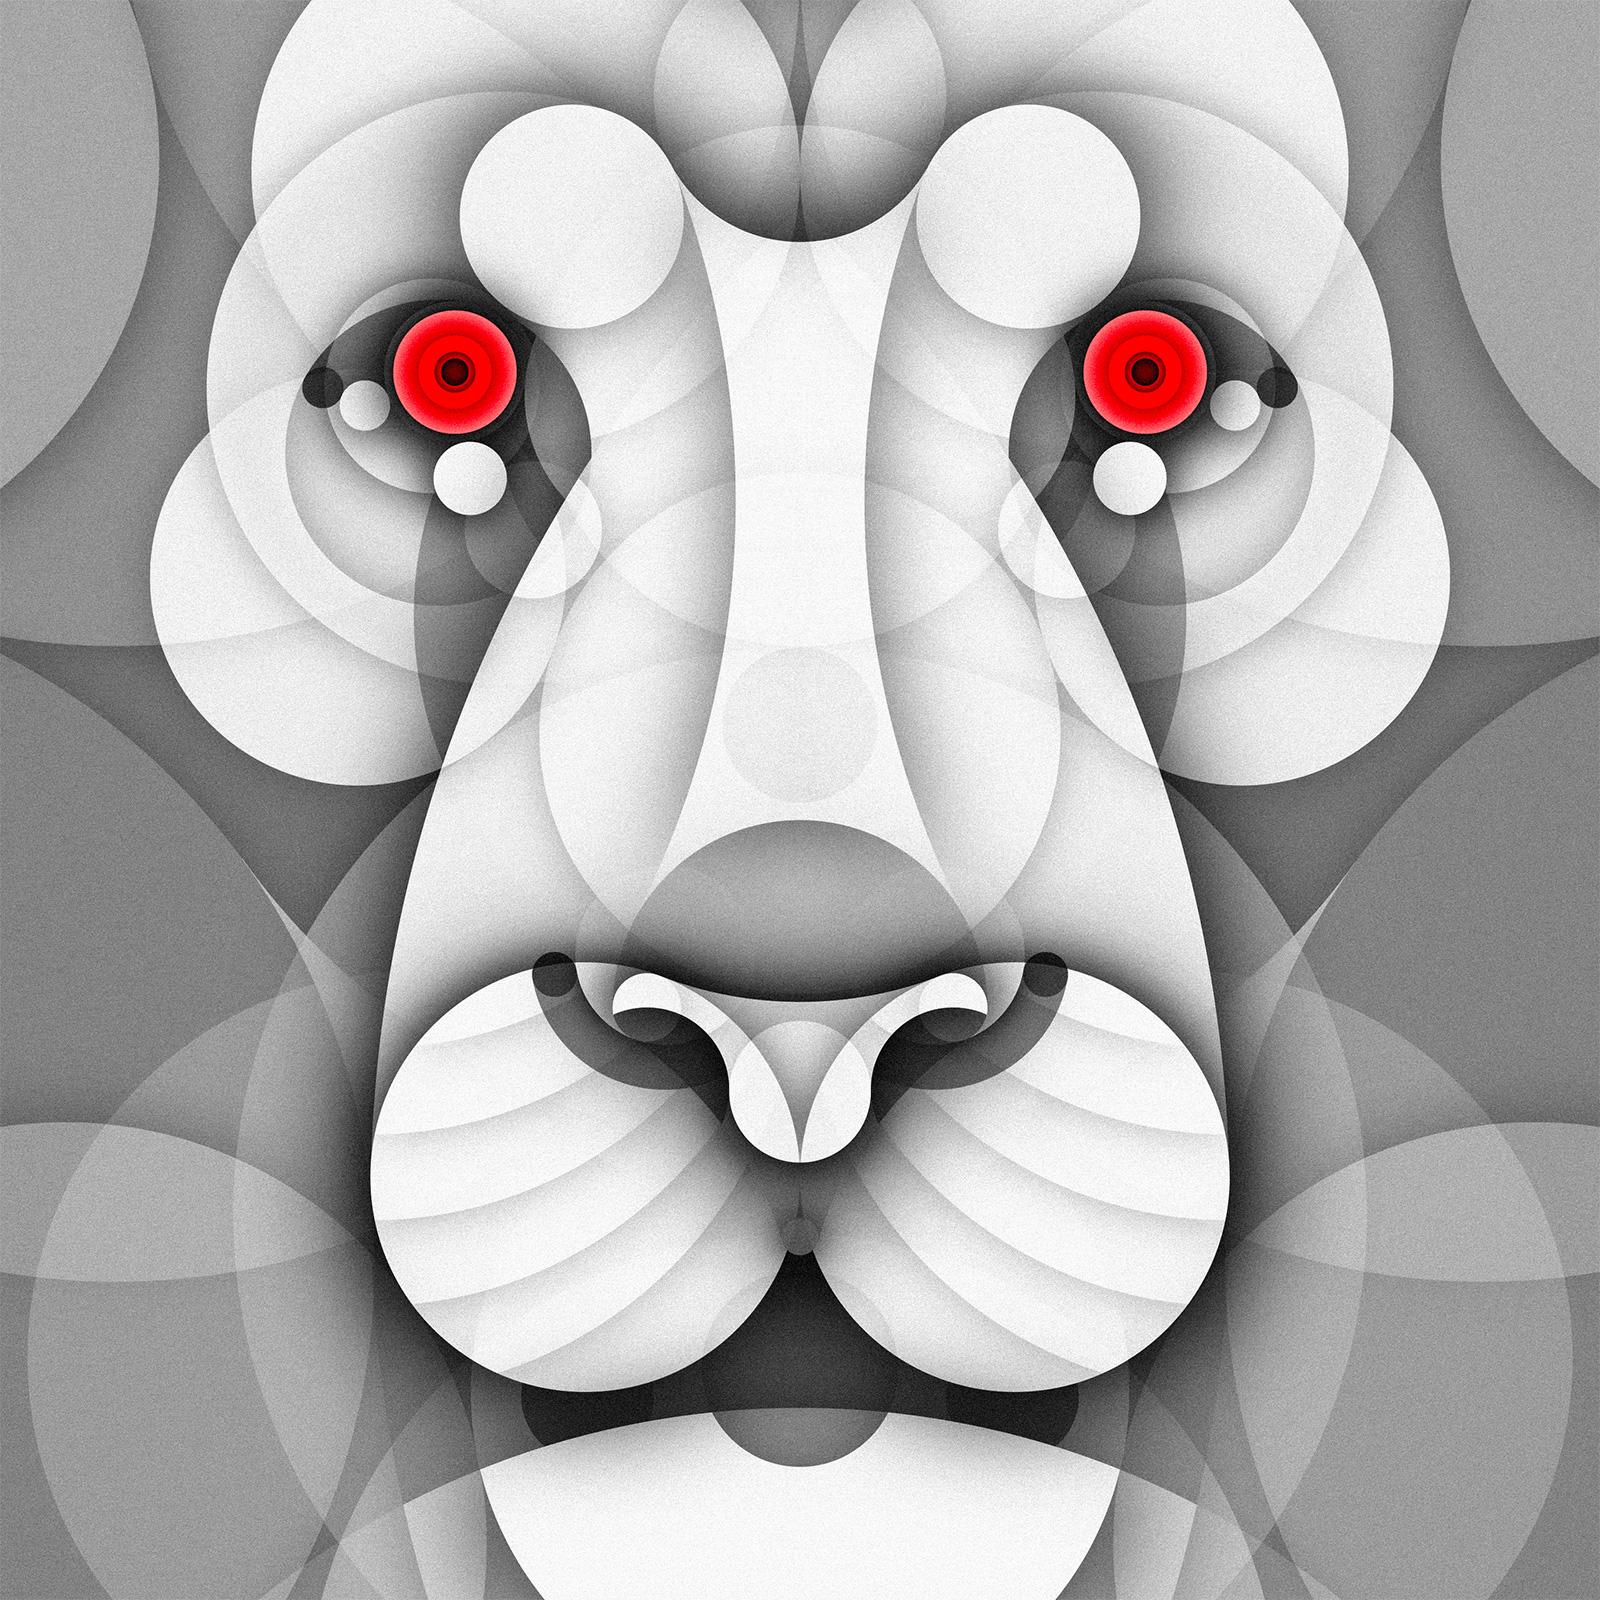 Albino Animals Series of Illustration Using Just Circles